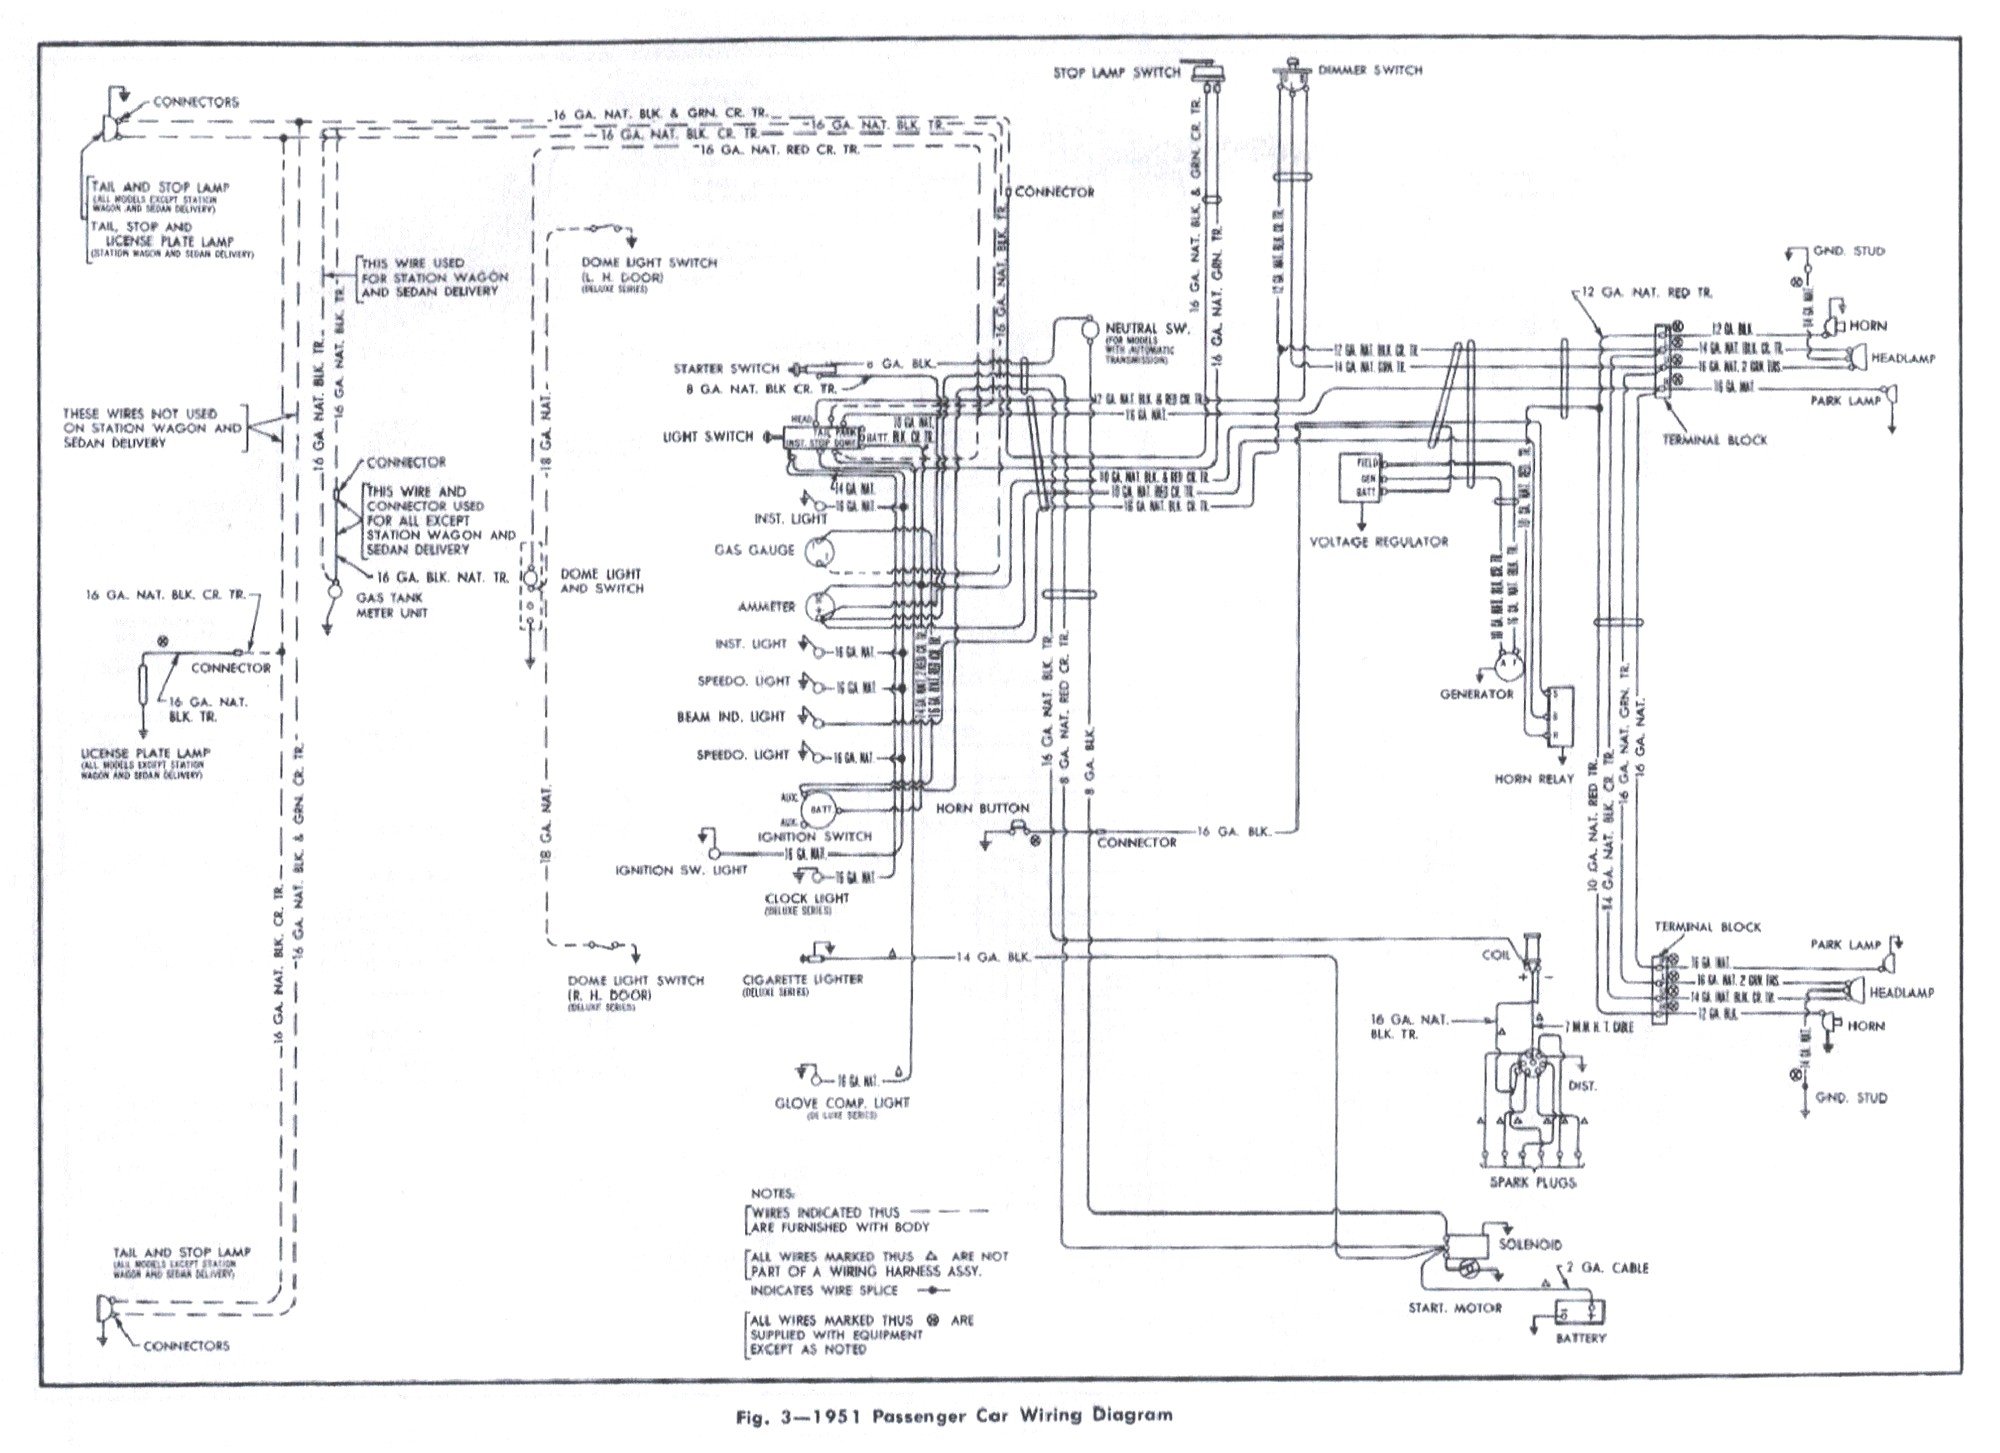 Chevrolet Wiring Harness Chevy 350 Engine Wiring Harness Wiring